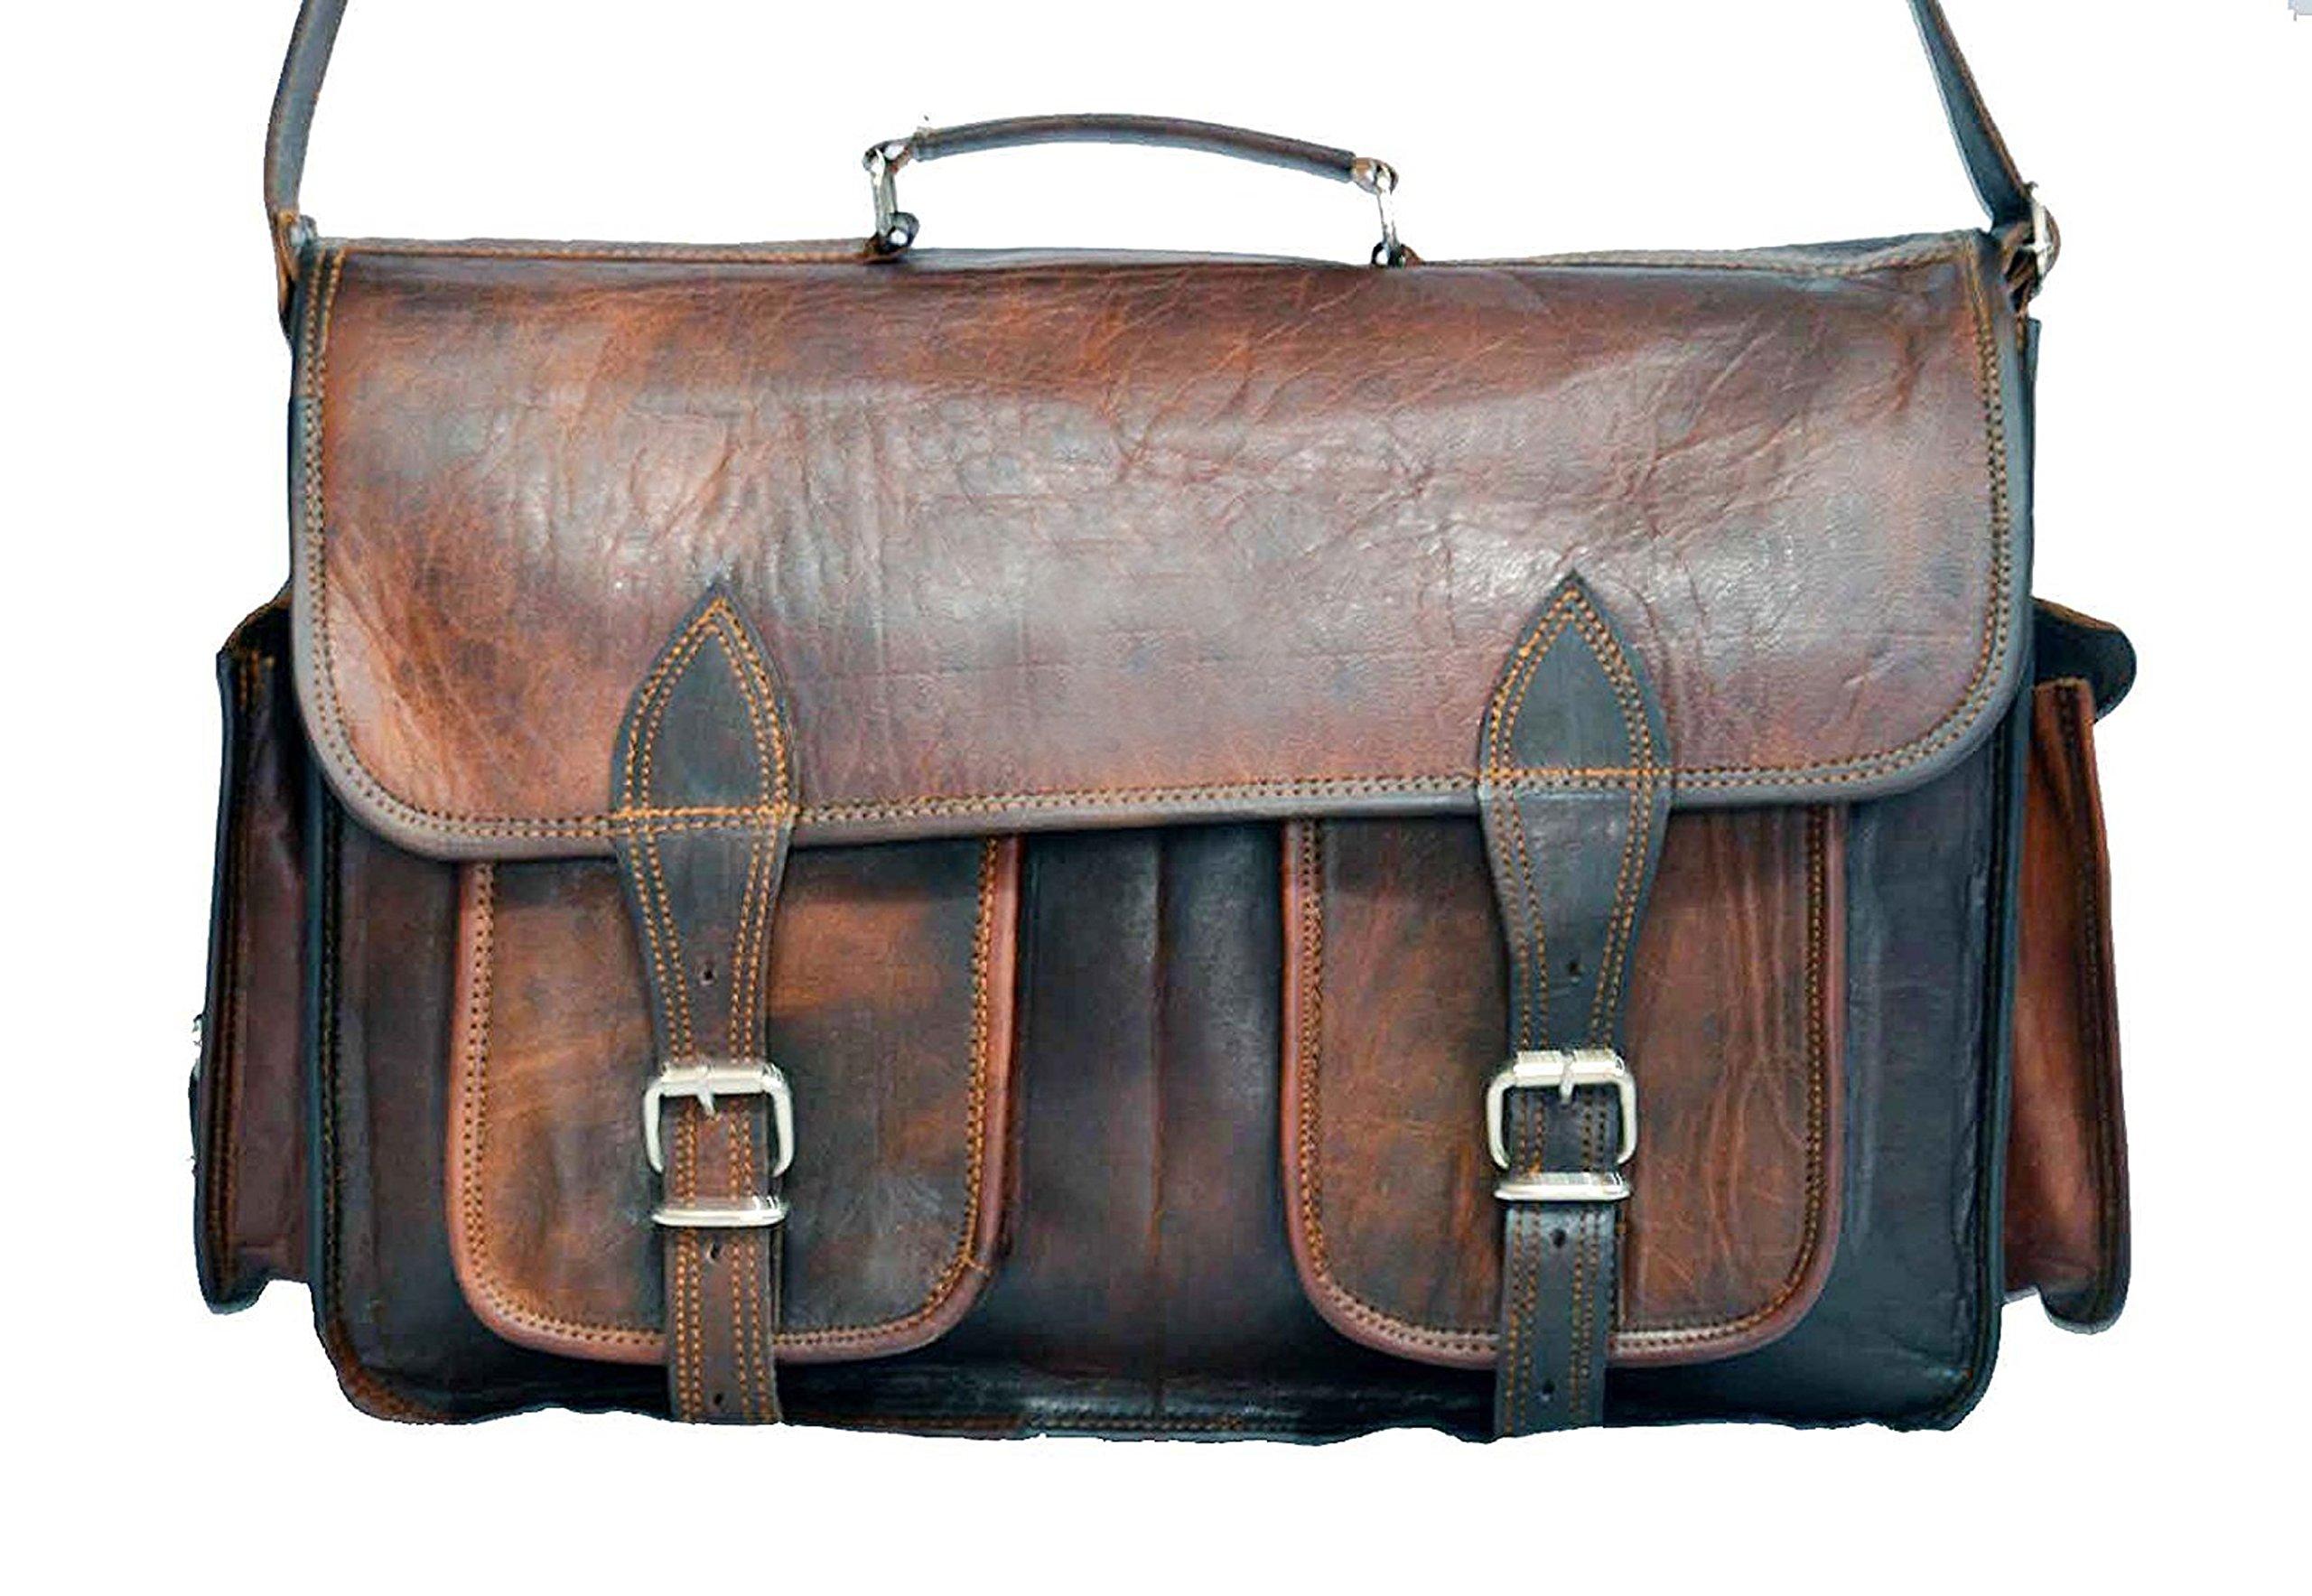 Leather Handmade Vintage Style Camera Bag/ Messenger/ Camera Bag Messenger Bag Laptop Bag